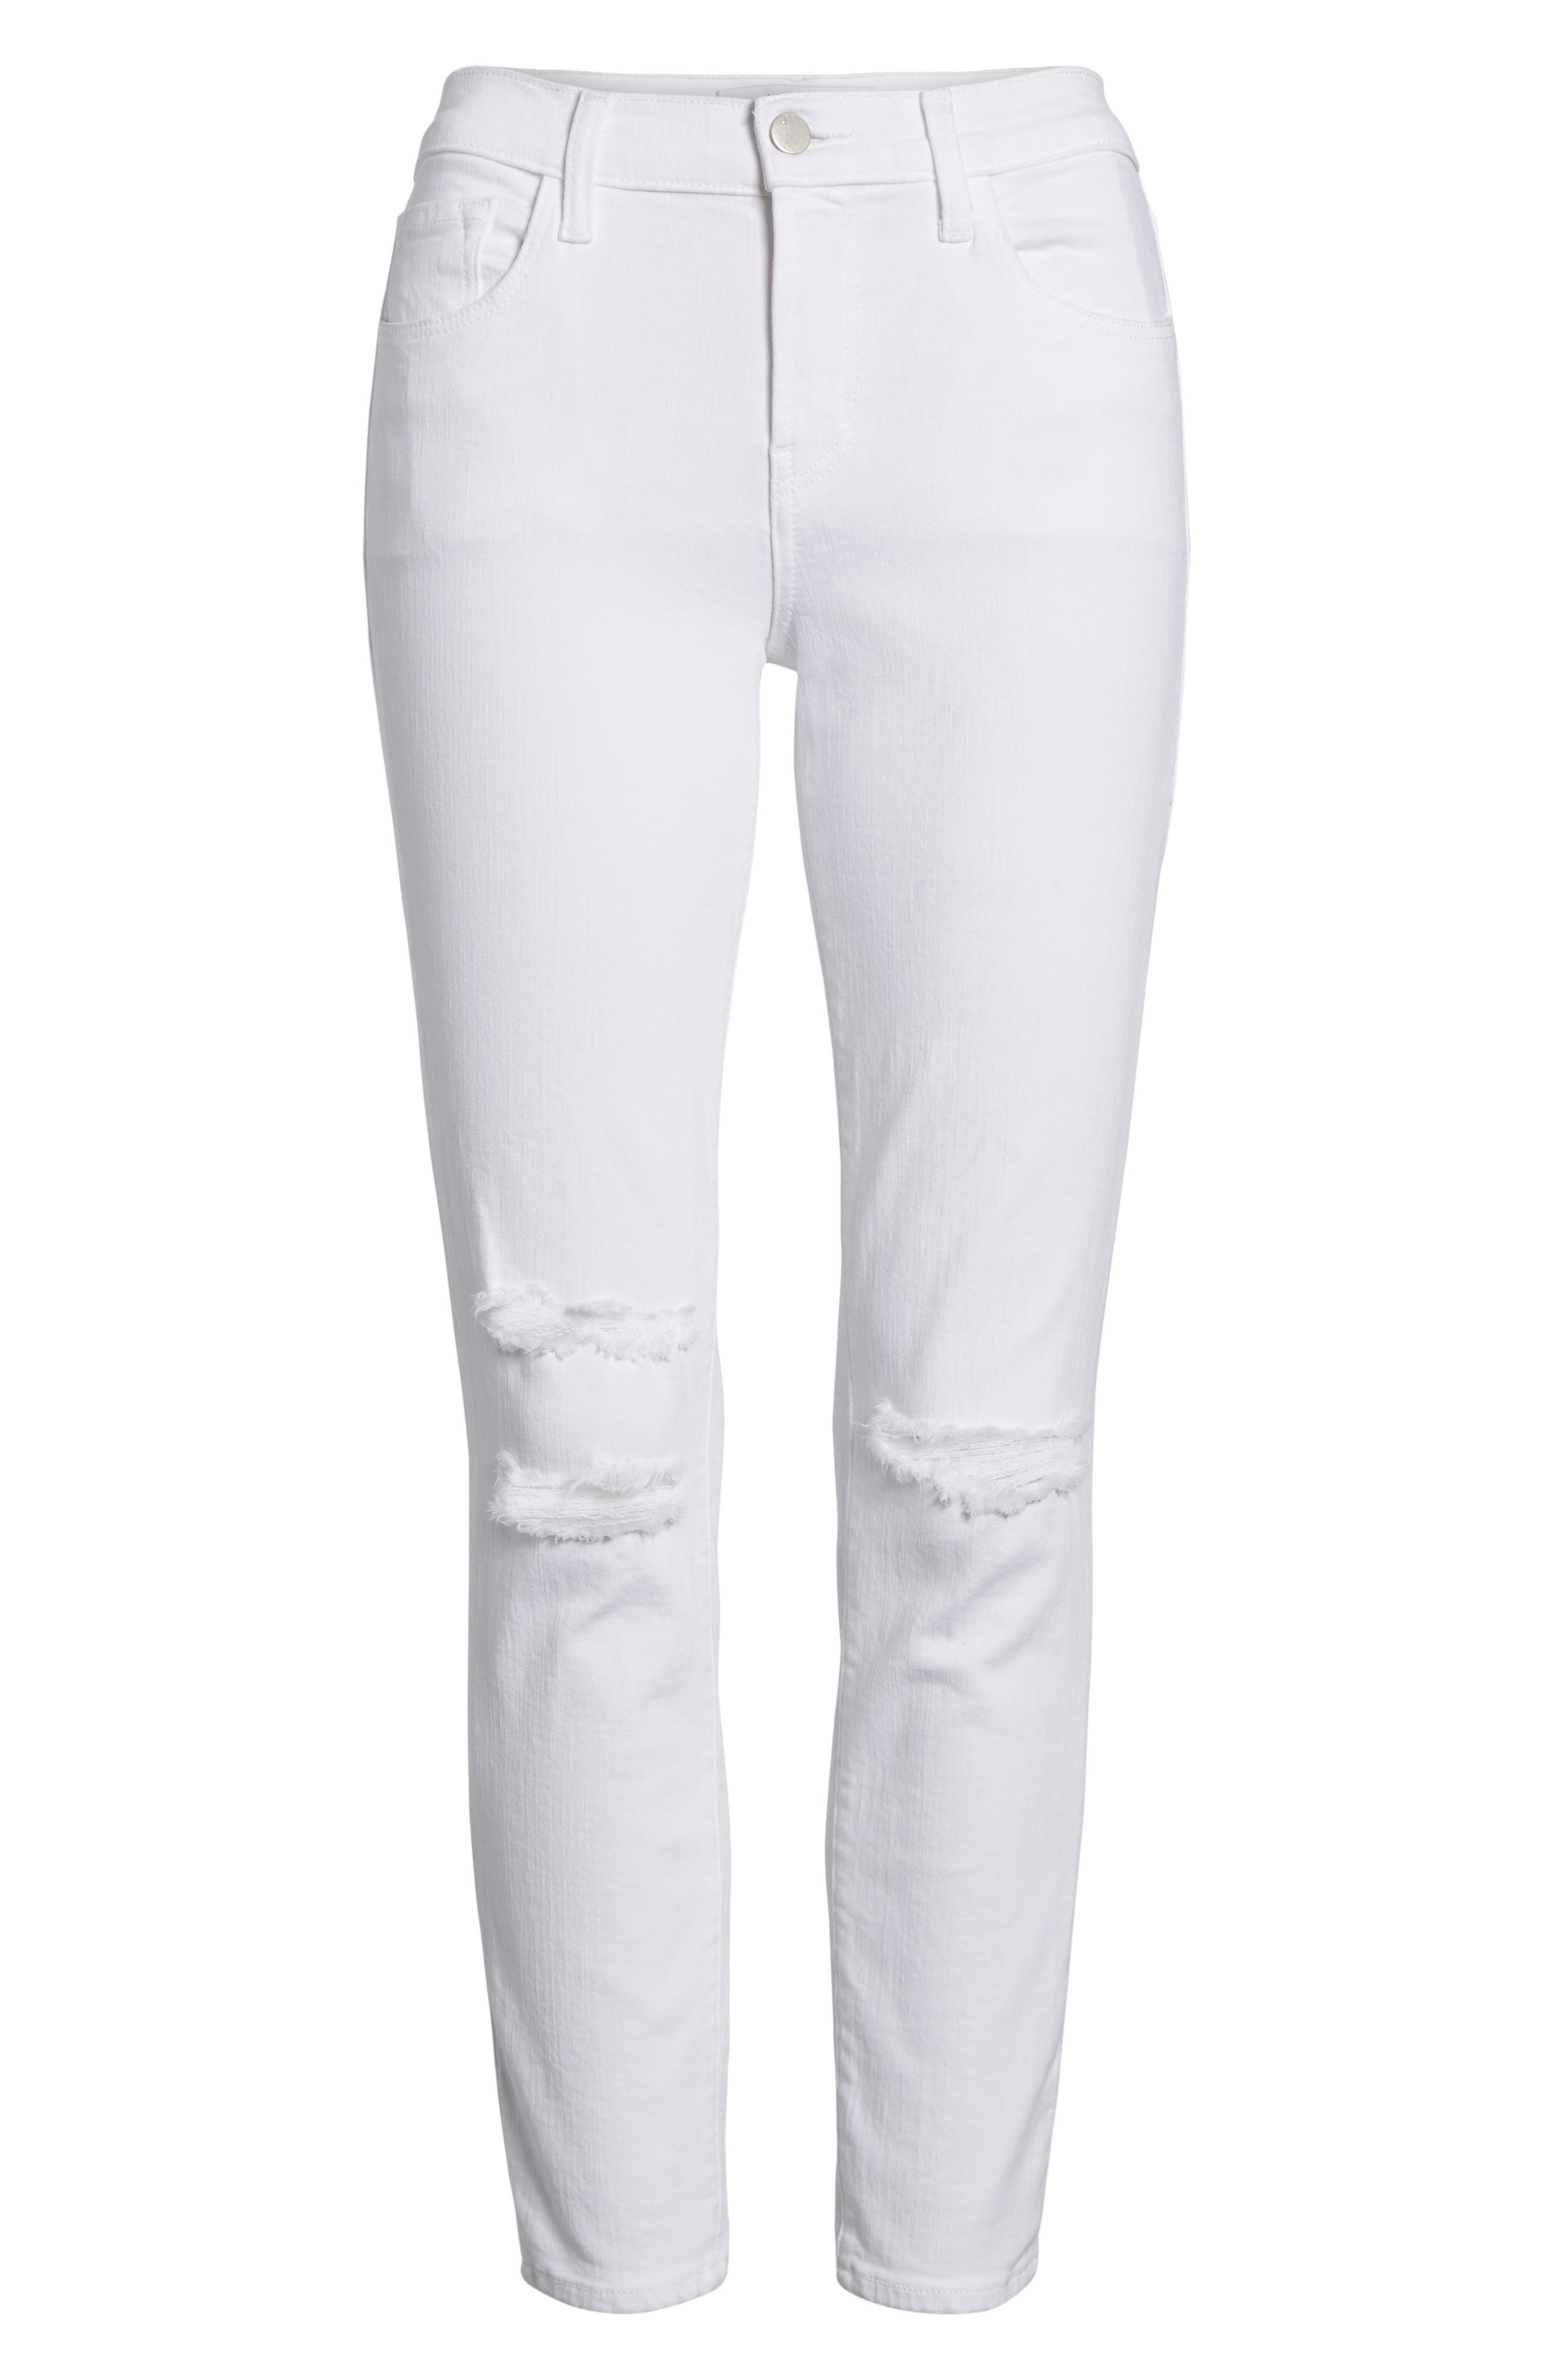 Mid-Rise Capri Skinny Jeans,                             Alternate thumbnail 7, color,                             White Mercy